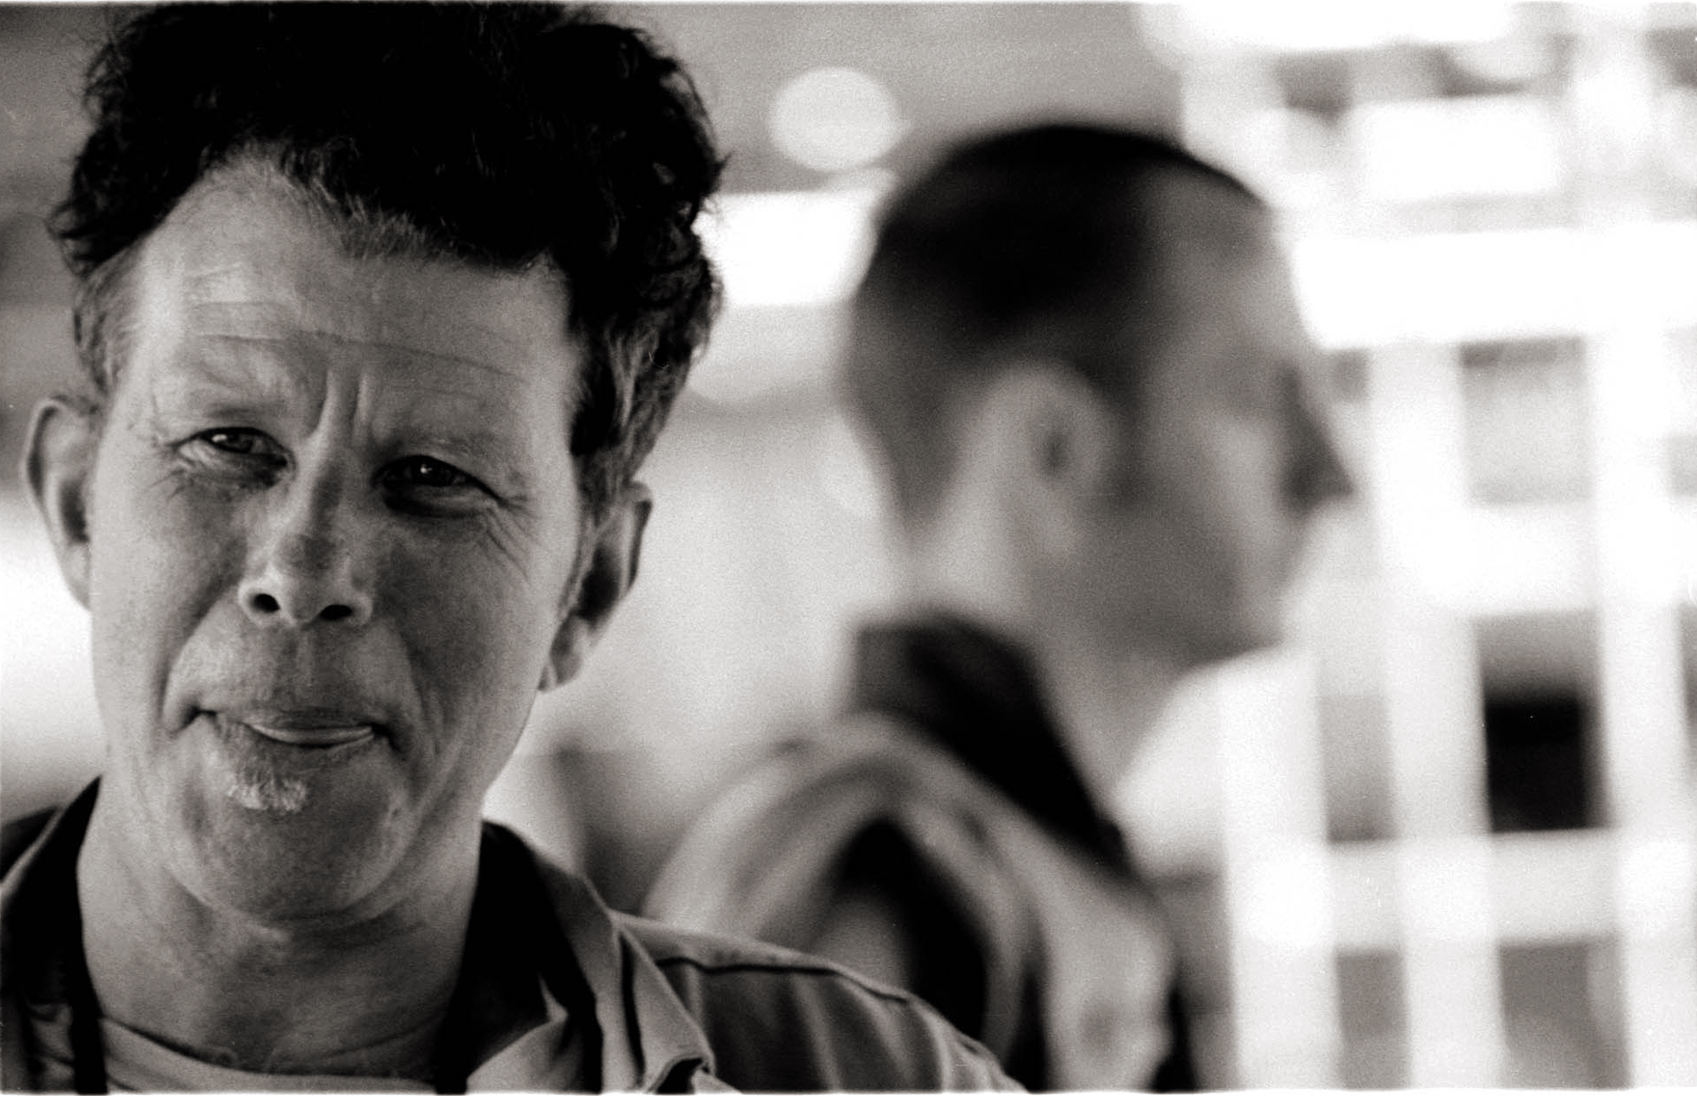 Tom Waits 6/15/96